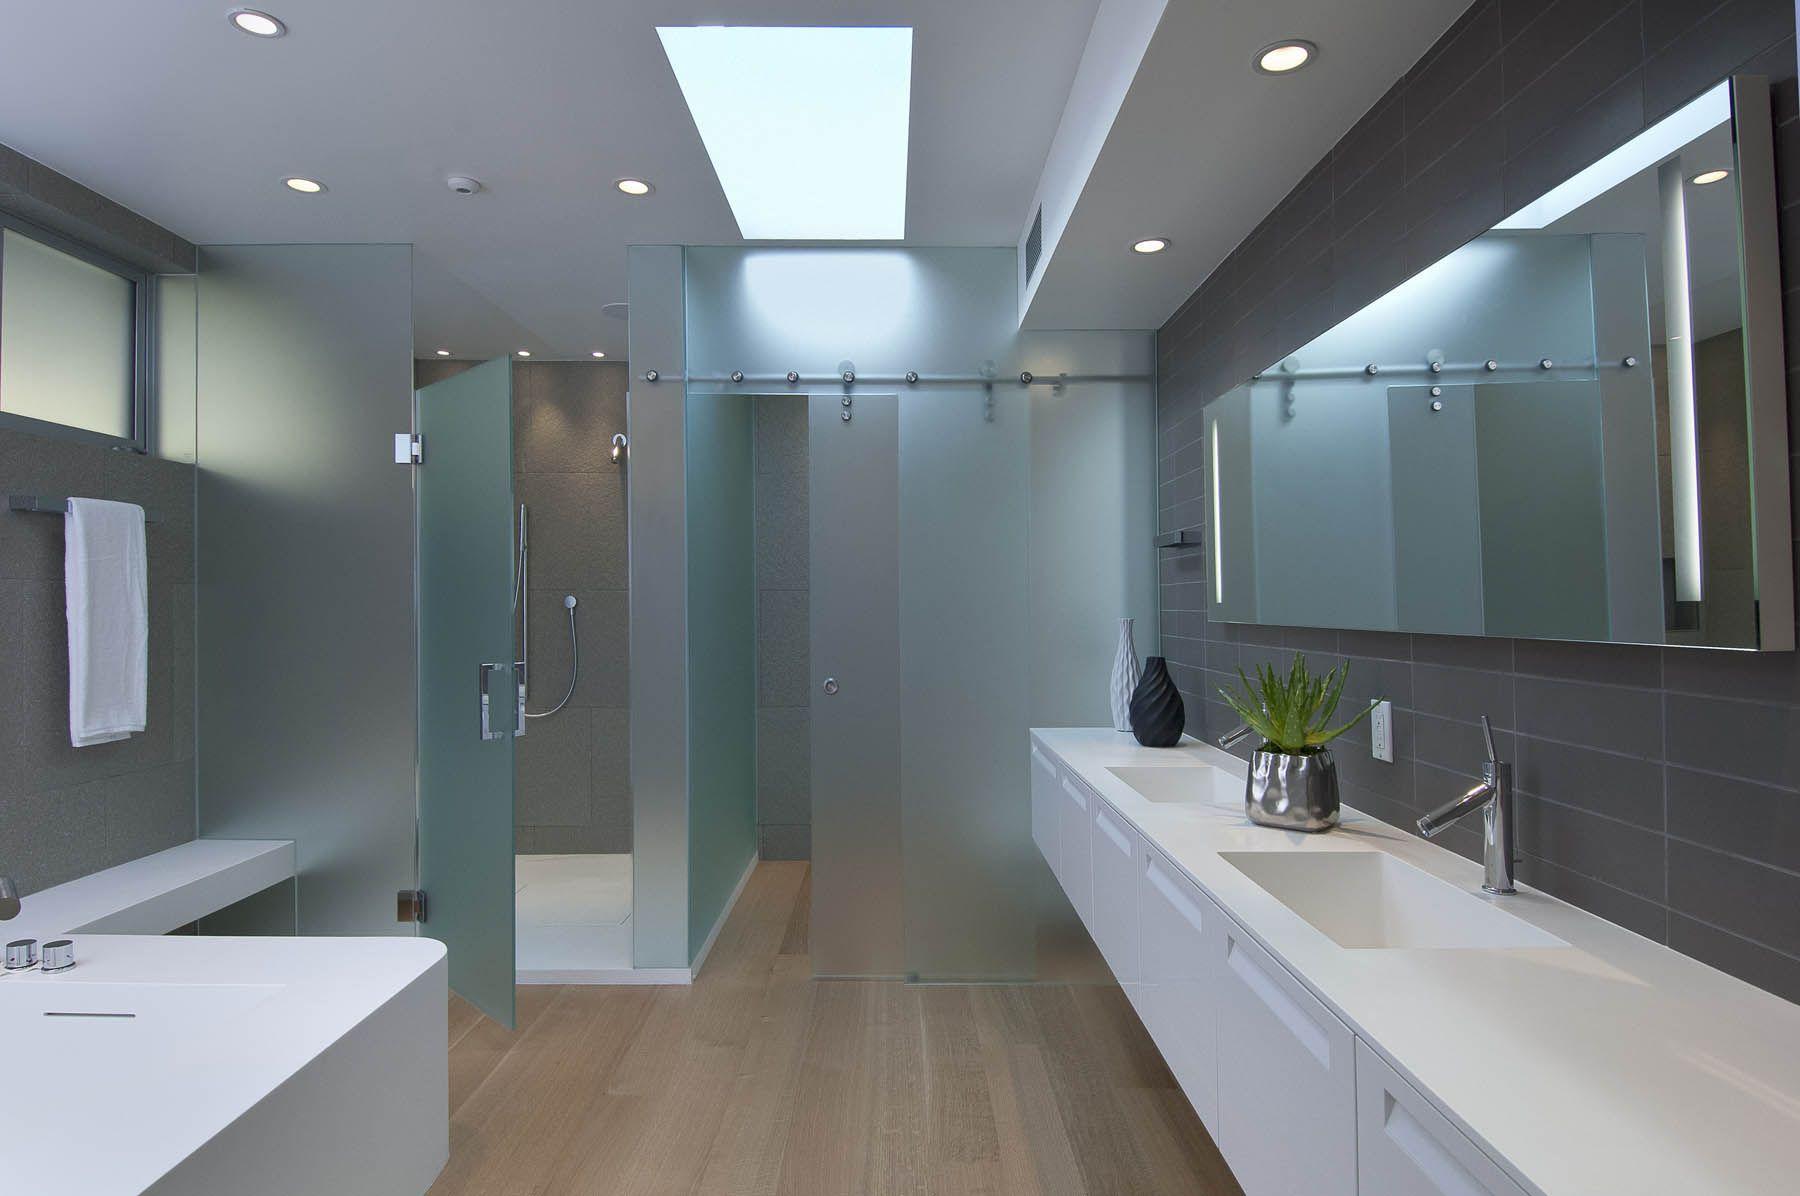 5 x 4 badezimmerdesigns the lavish doheny residence in hollywood hills   home  pinterest